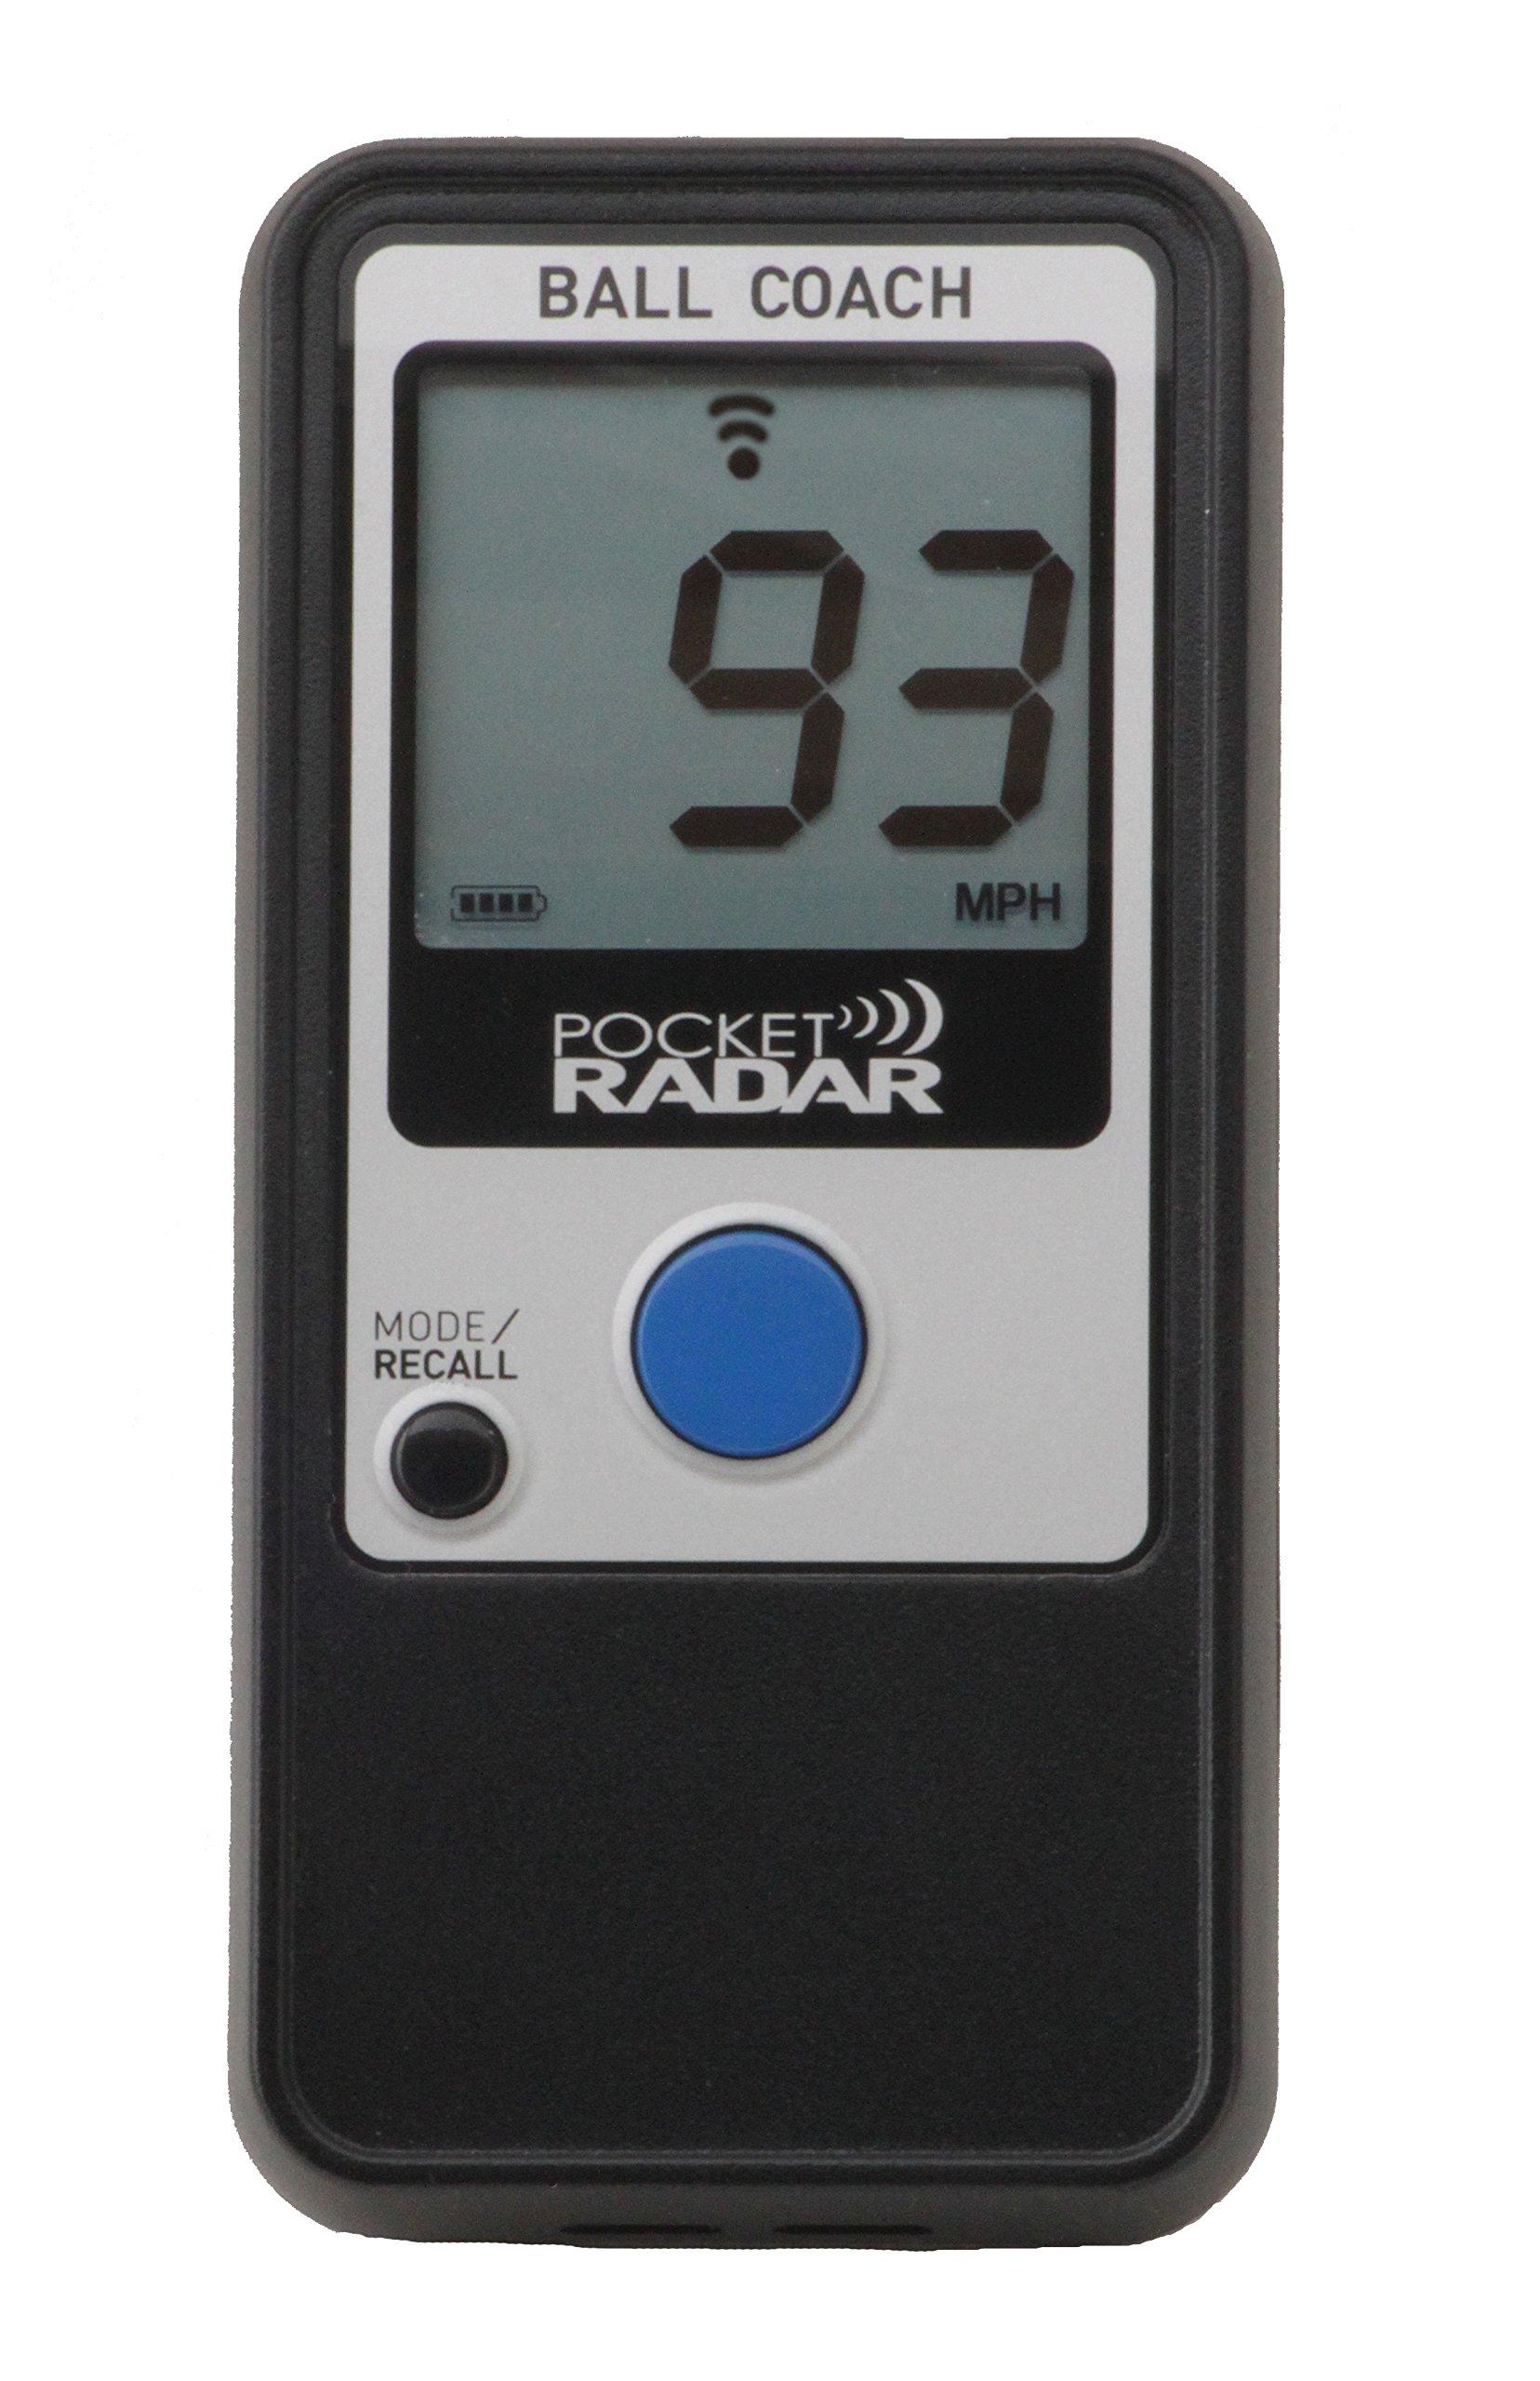 Pocket Radar Ball Coach / Pro-Level Speed Training Tool and Radar Gun by Pocket Radar